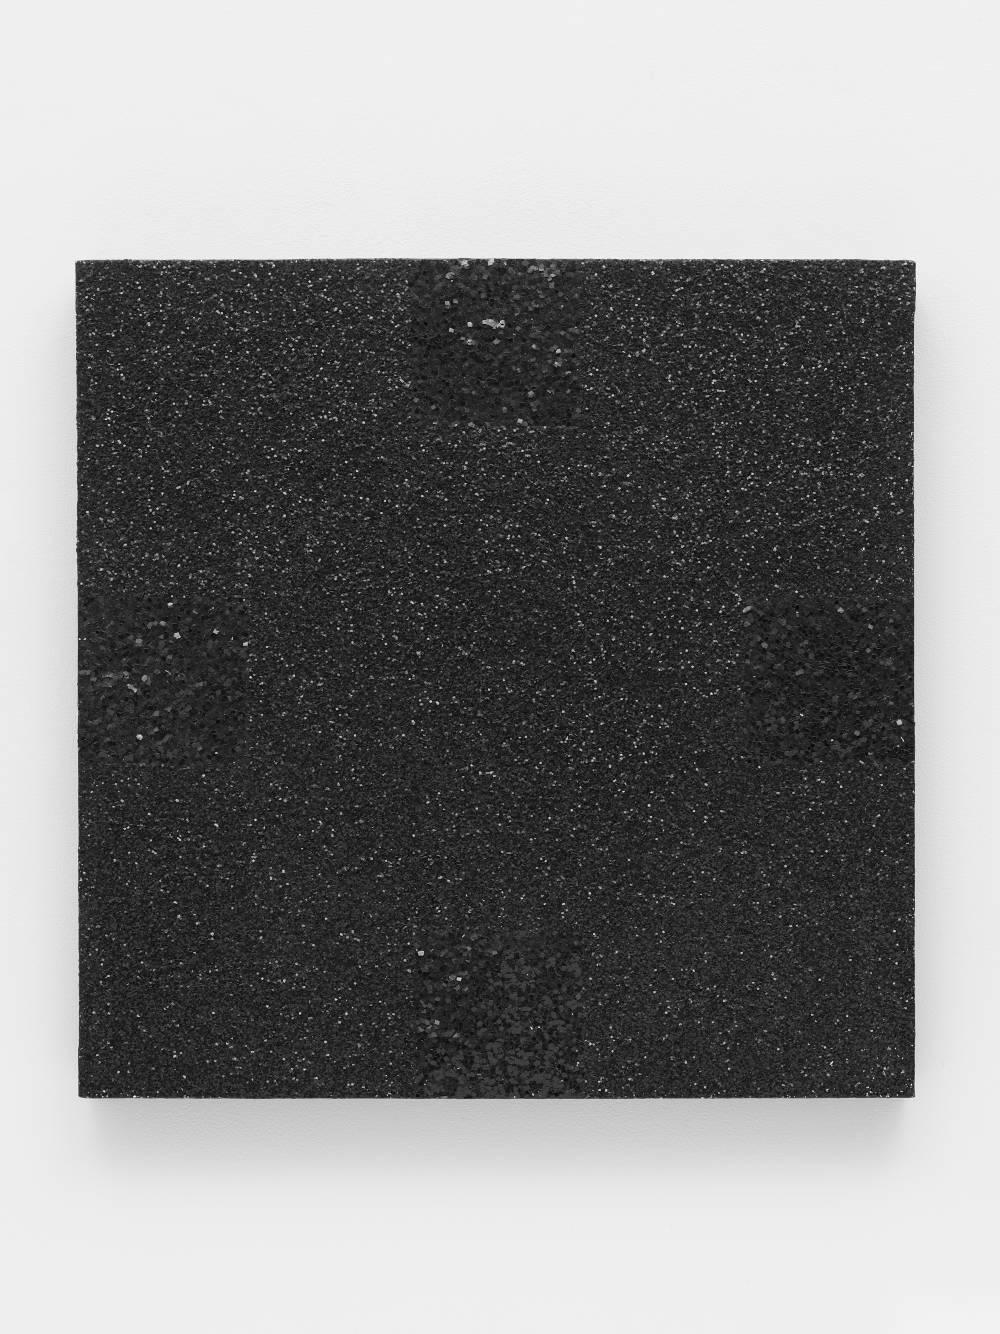 Untitled (Black Light Painting, Glitter Series)